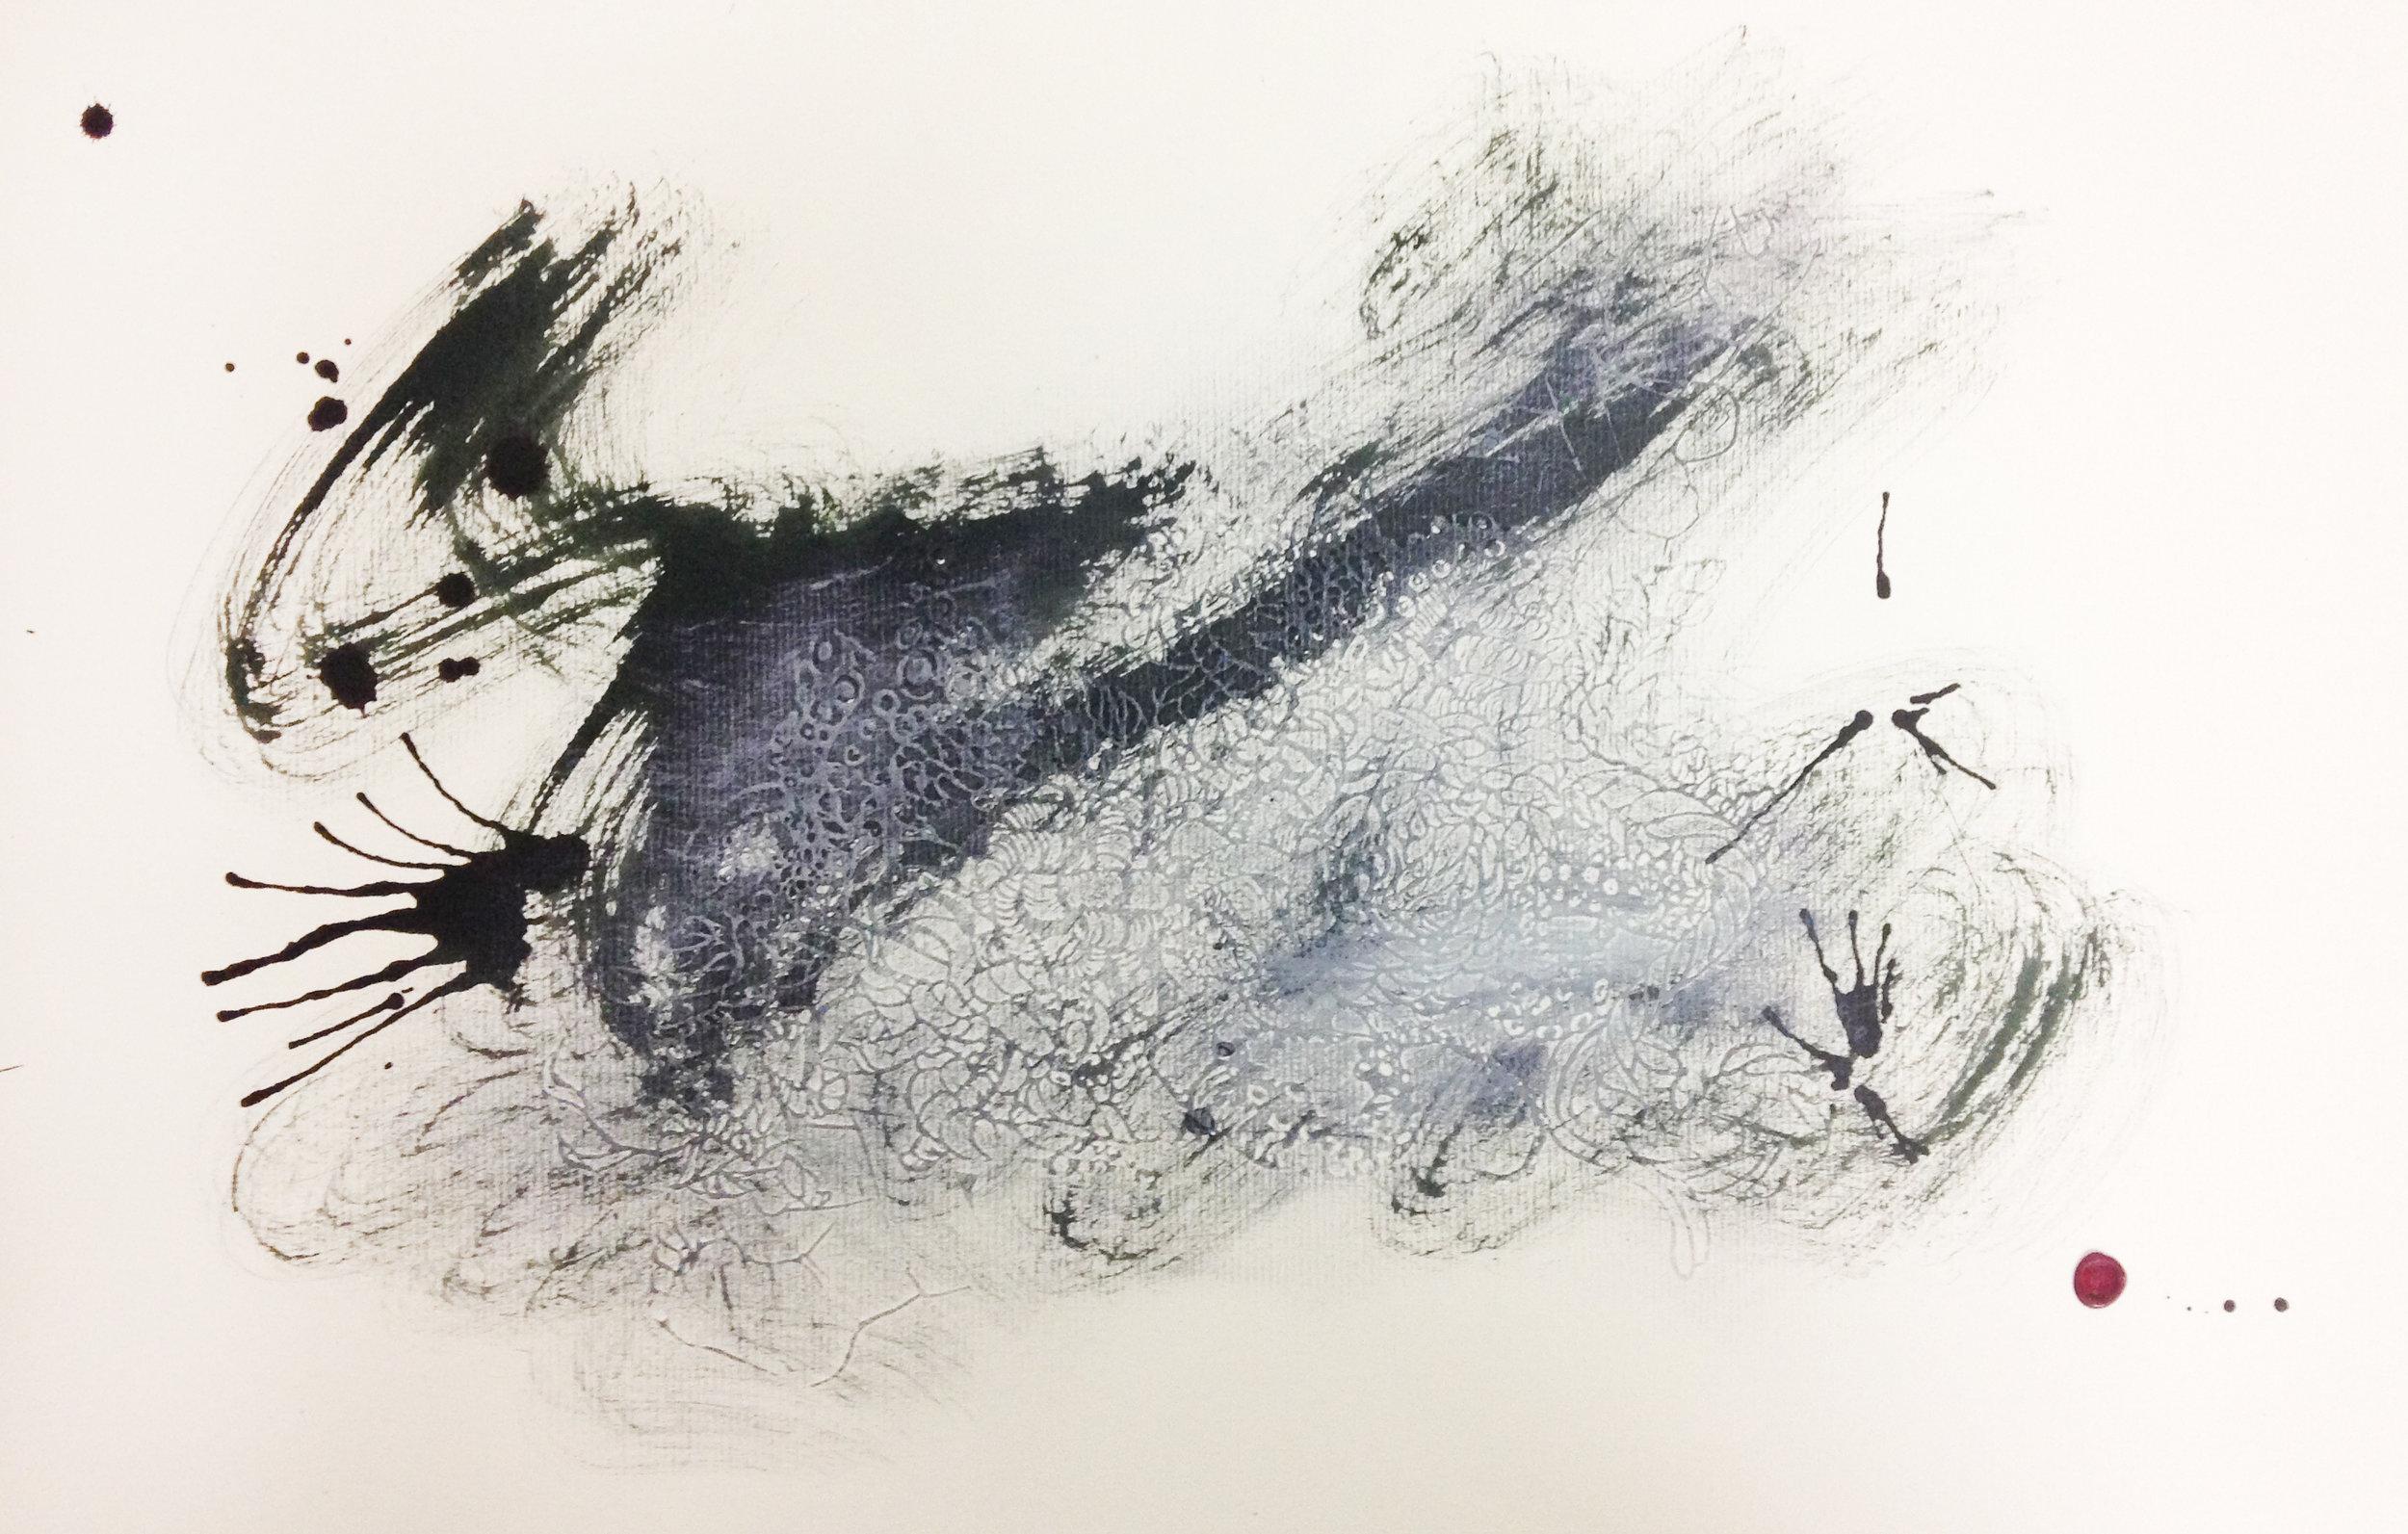 'Bedlam #3' ,   Embossing, inks, gouache, wax signature, 2014, 488 x 305mm.